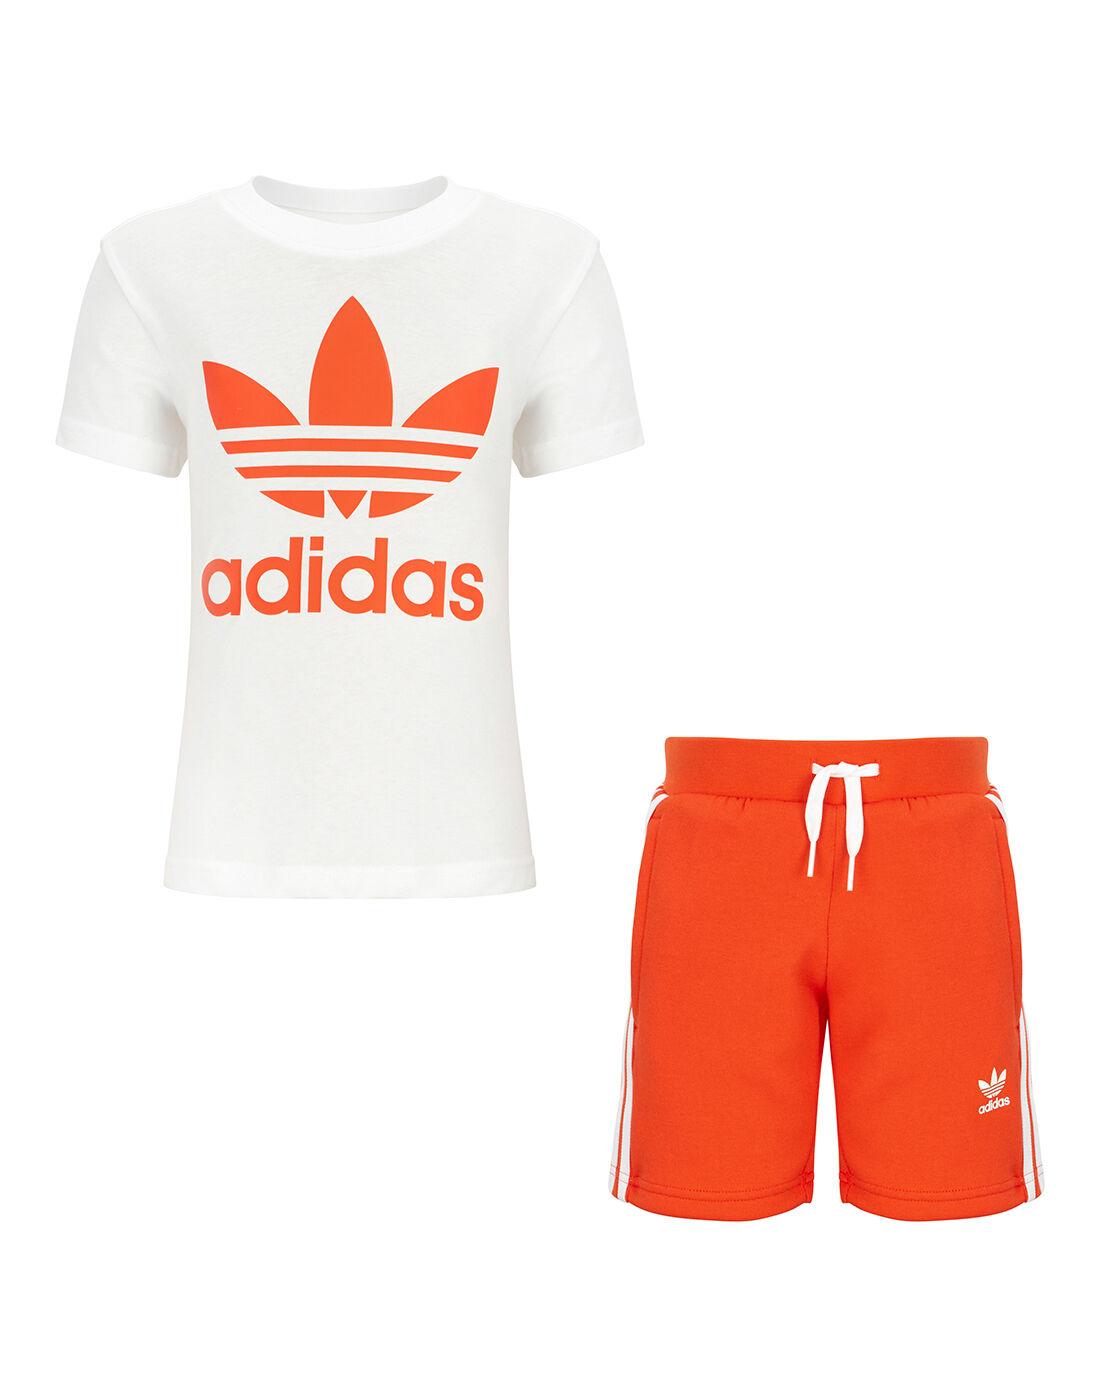 Boy's Tracksuits | Nike & adidas | Life Style Sports